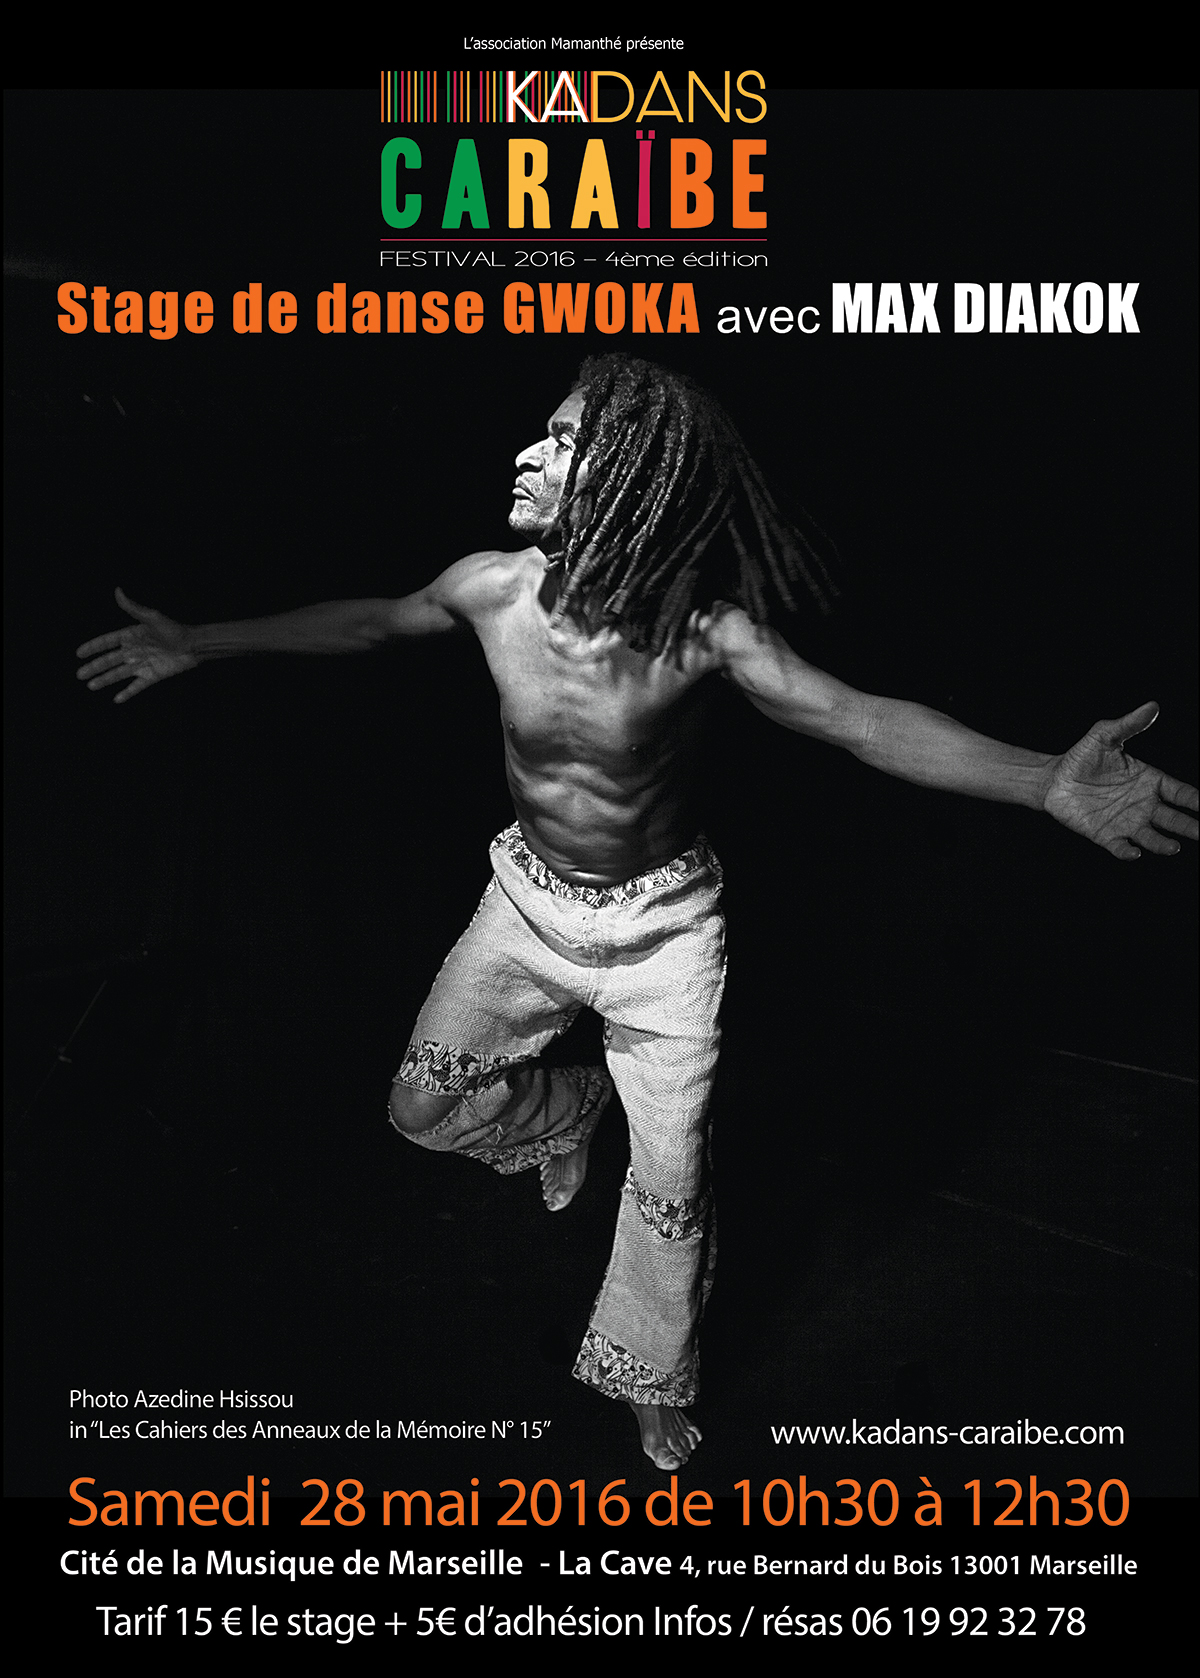 28 mai 2016 – Stage de danse gwoka avec Max Diakok